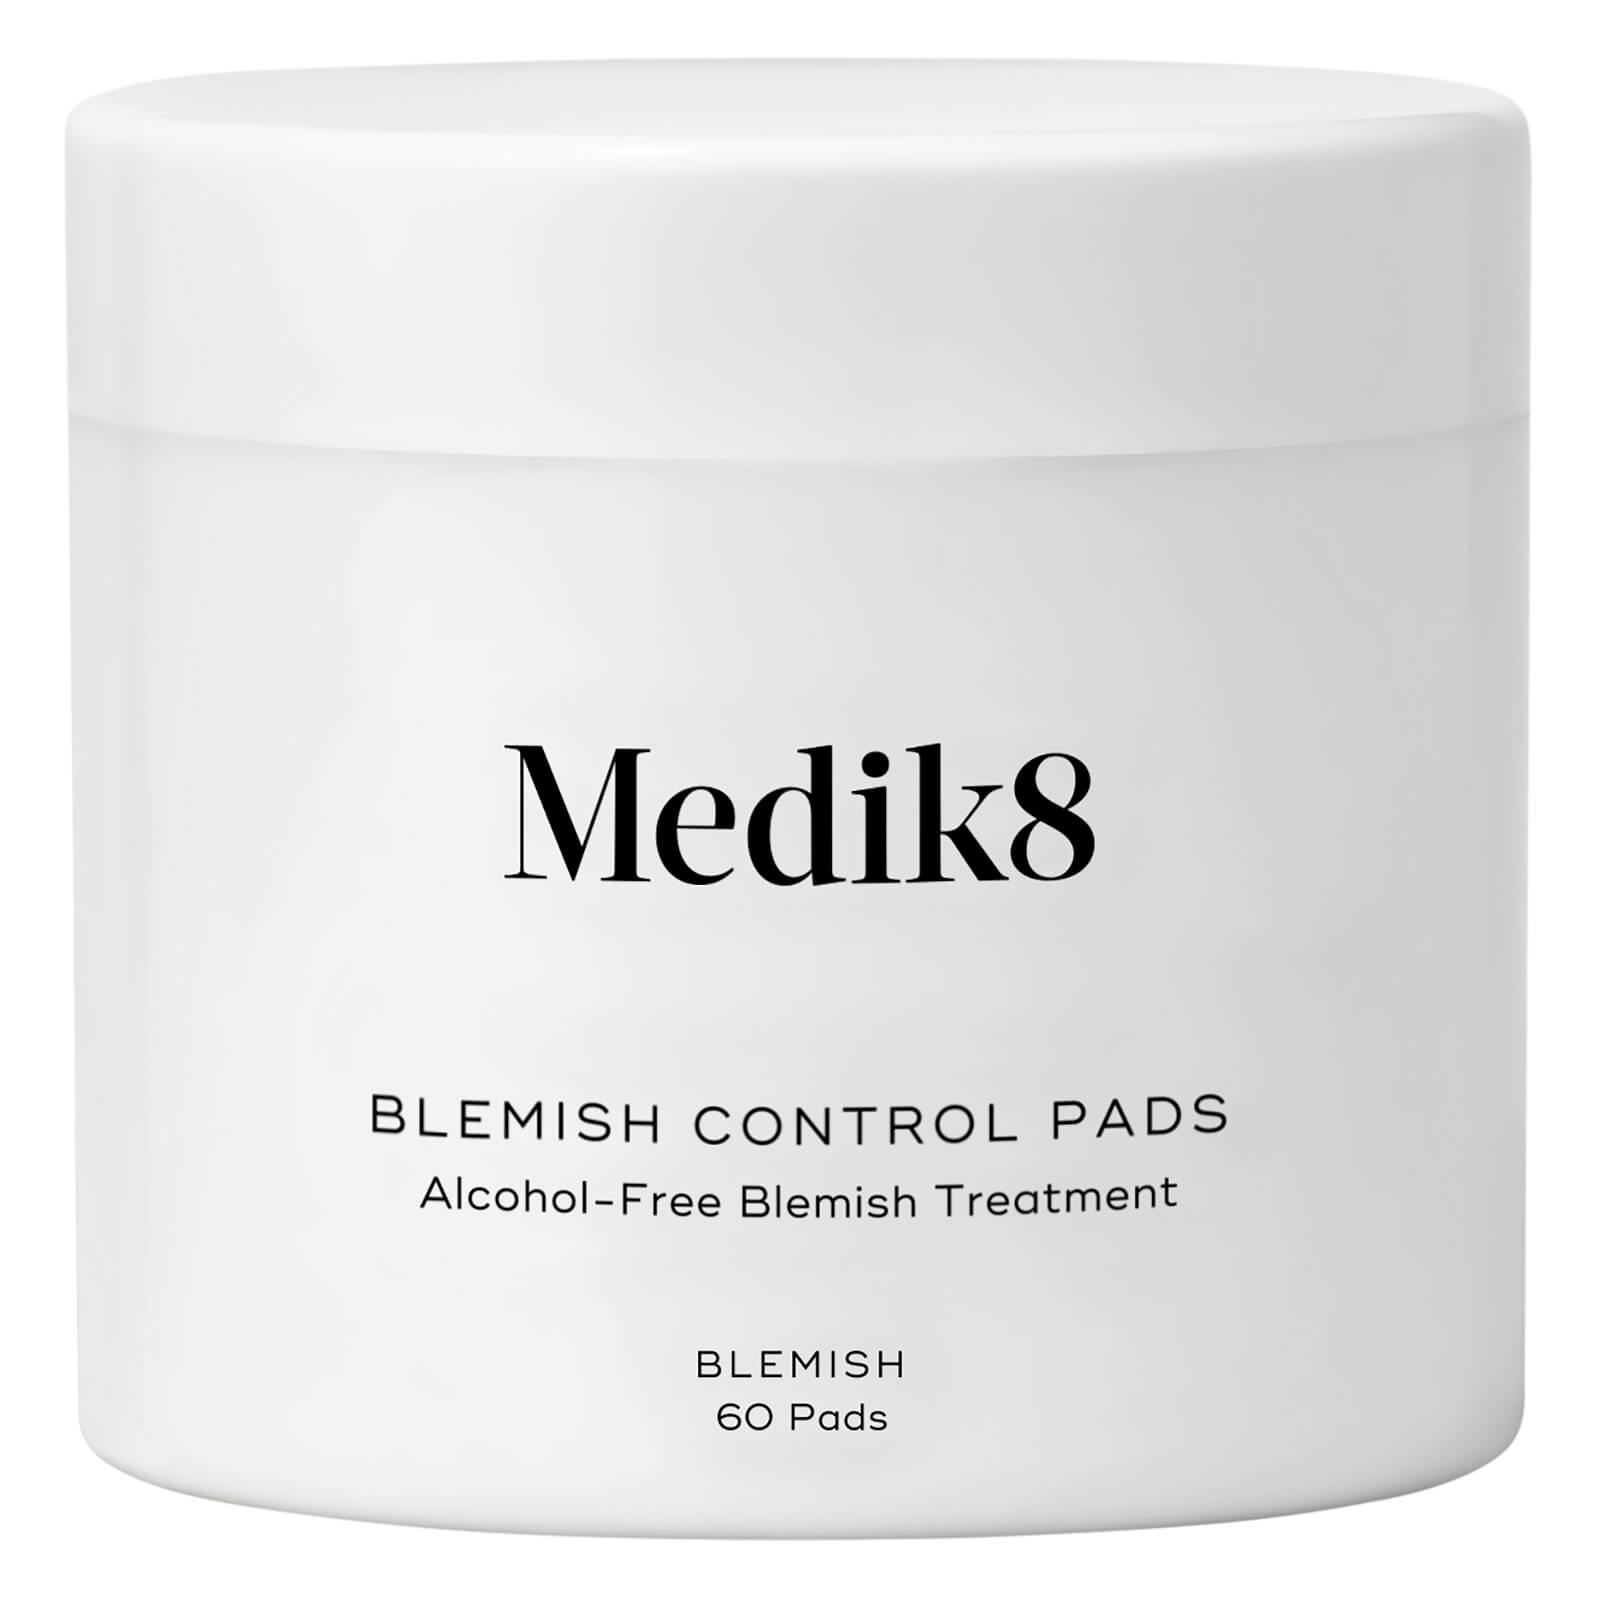 Medik8 Blemish Control Pads (60 Pads)